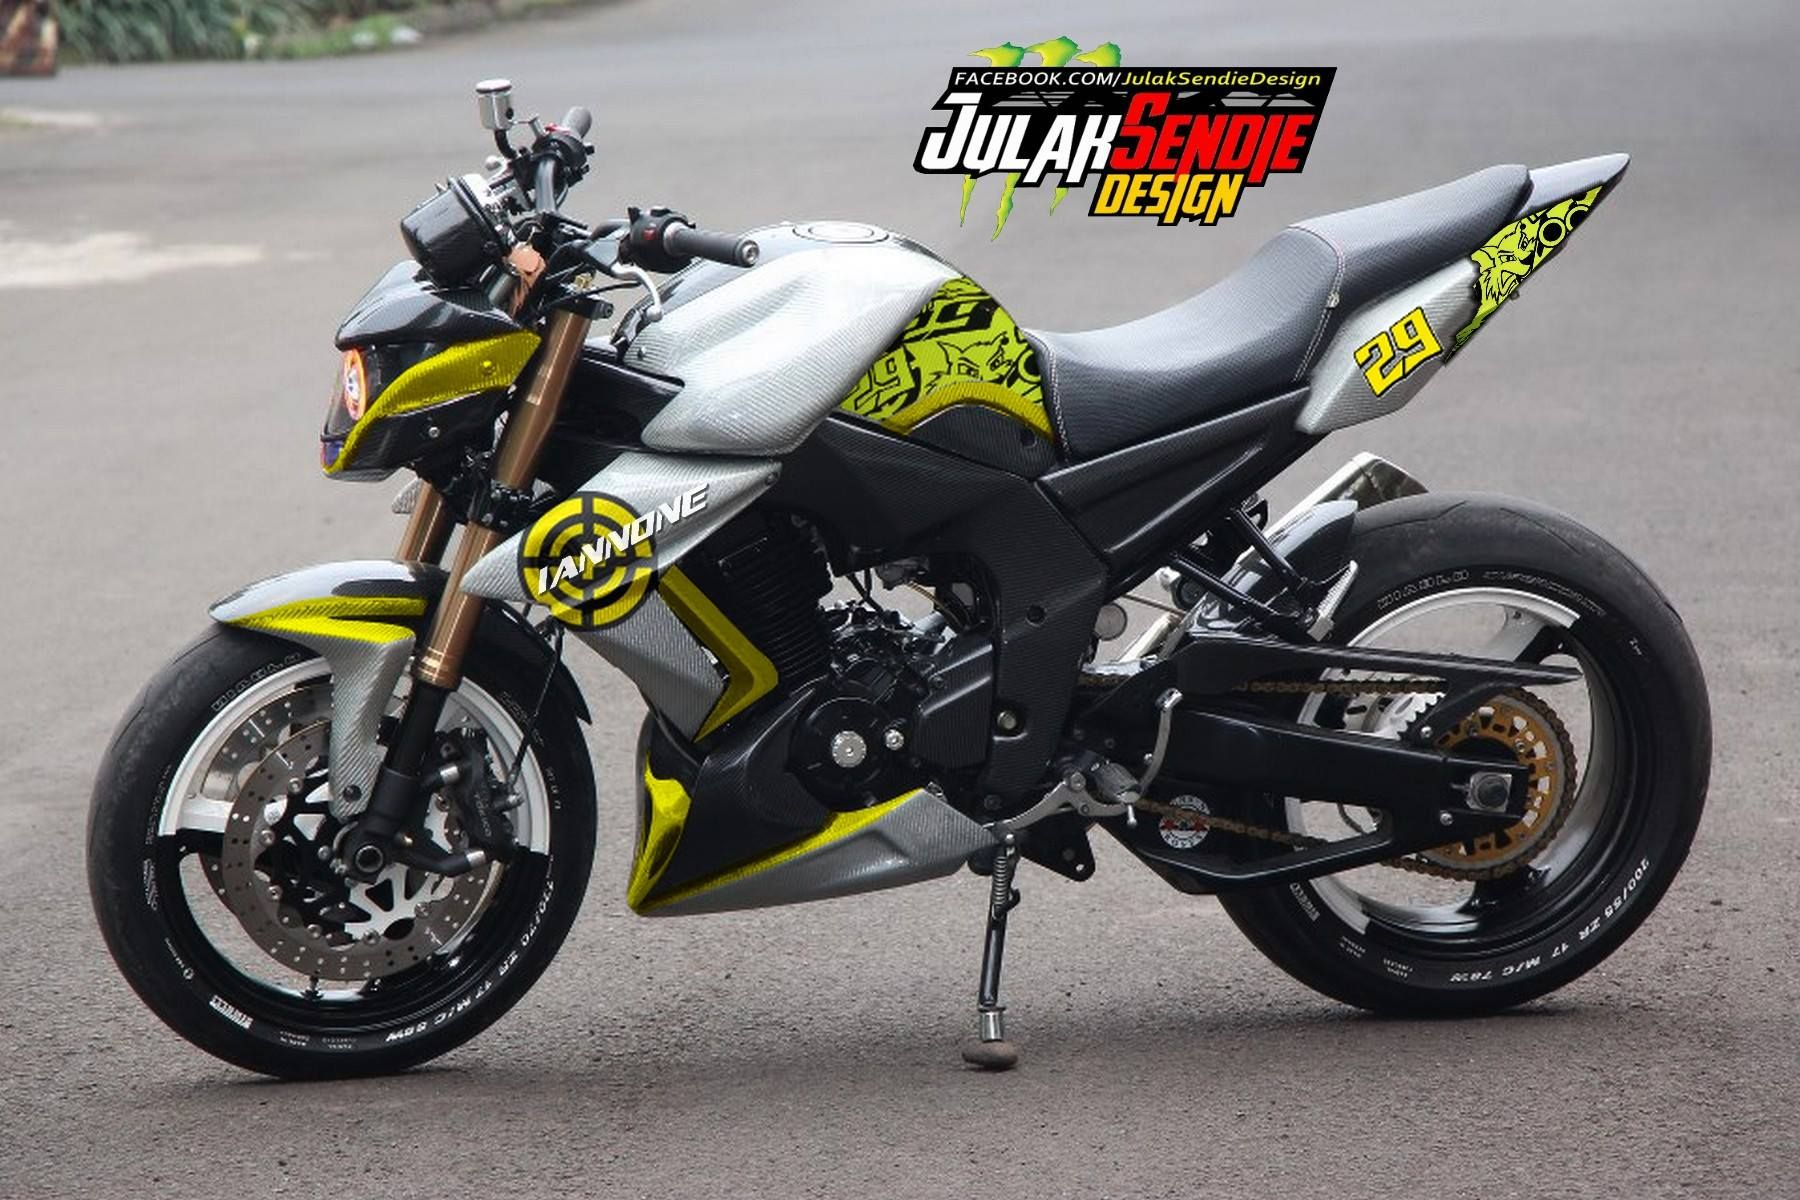 2019 Yamaha FZ V3.0 Colors: Metric Black, Racing Blue ( FI